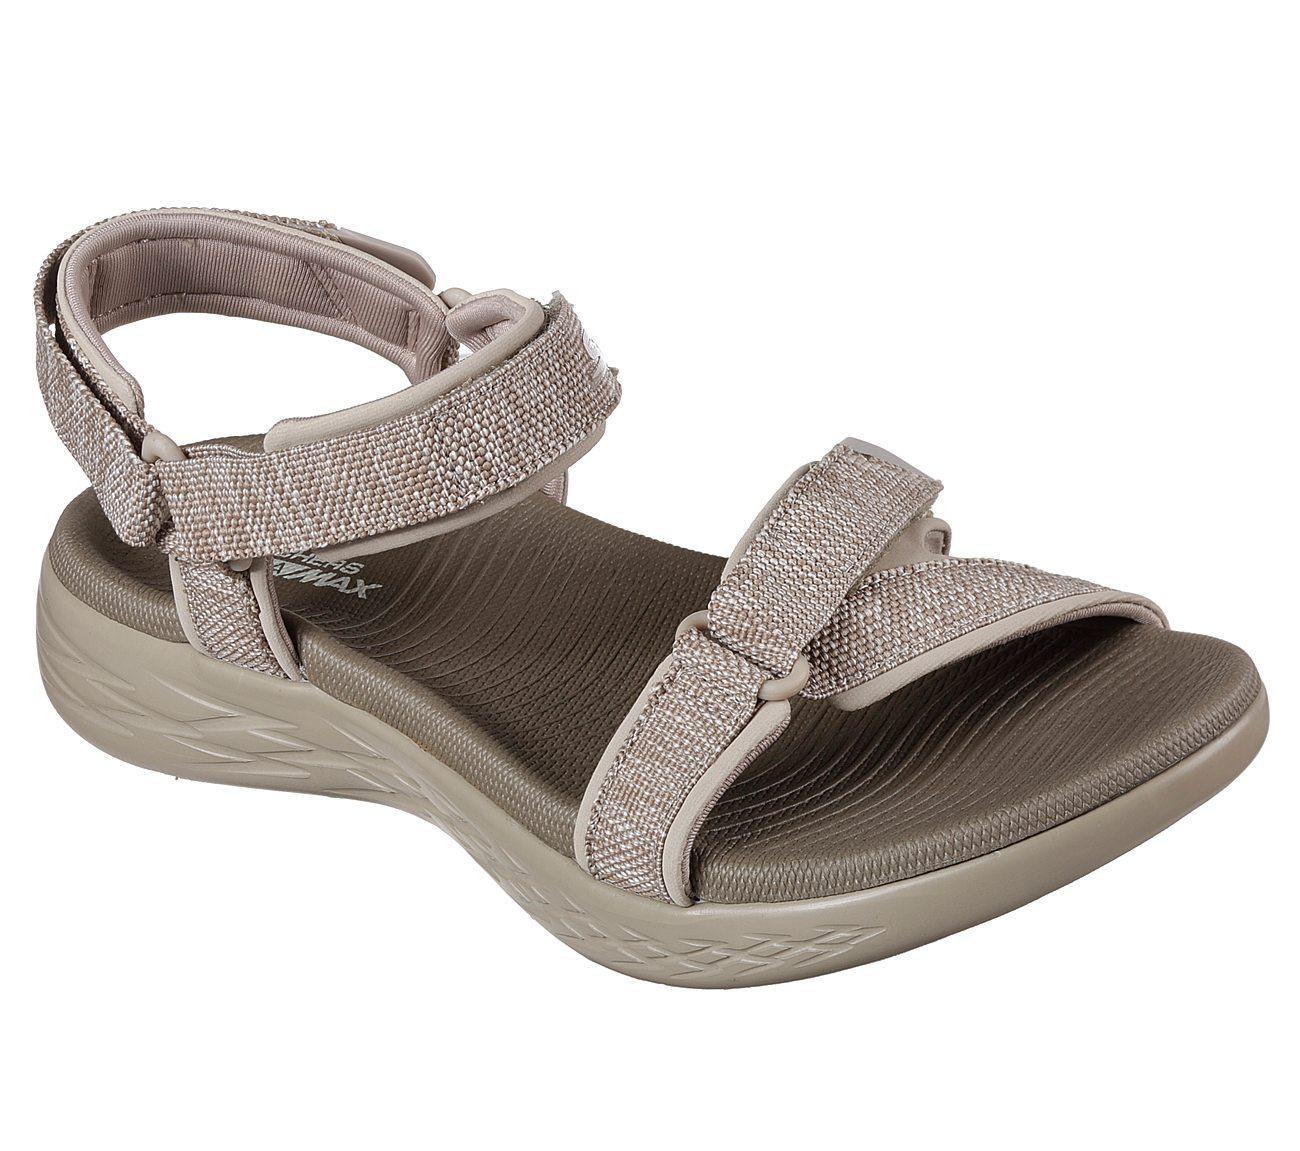 Ankle strap sandals, Skechers